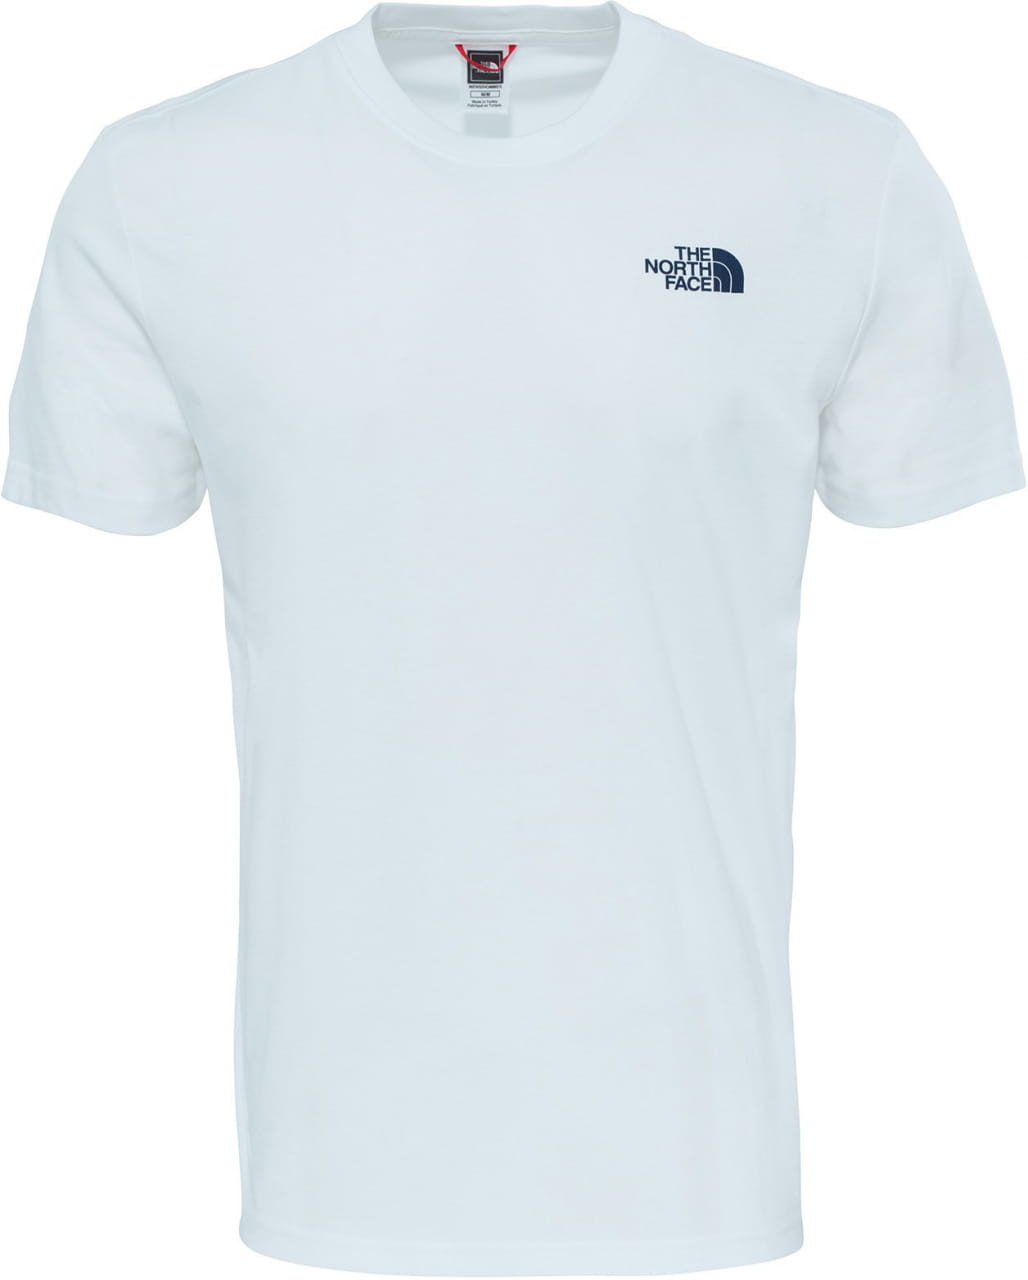 Pánské tričko The North Face Men's Redbox Celebration T-Shirt